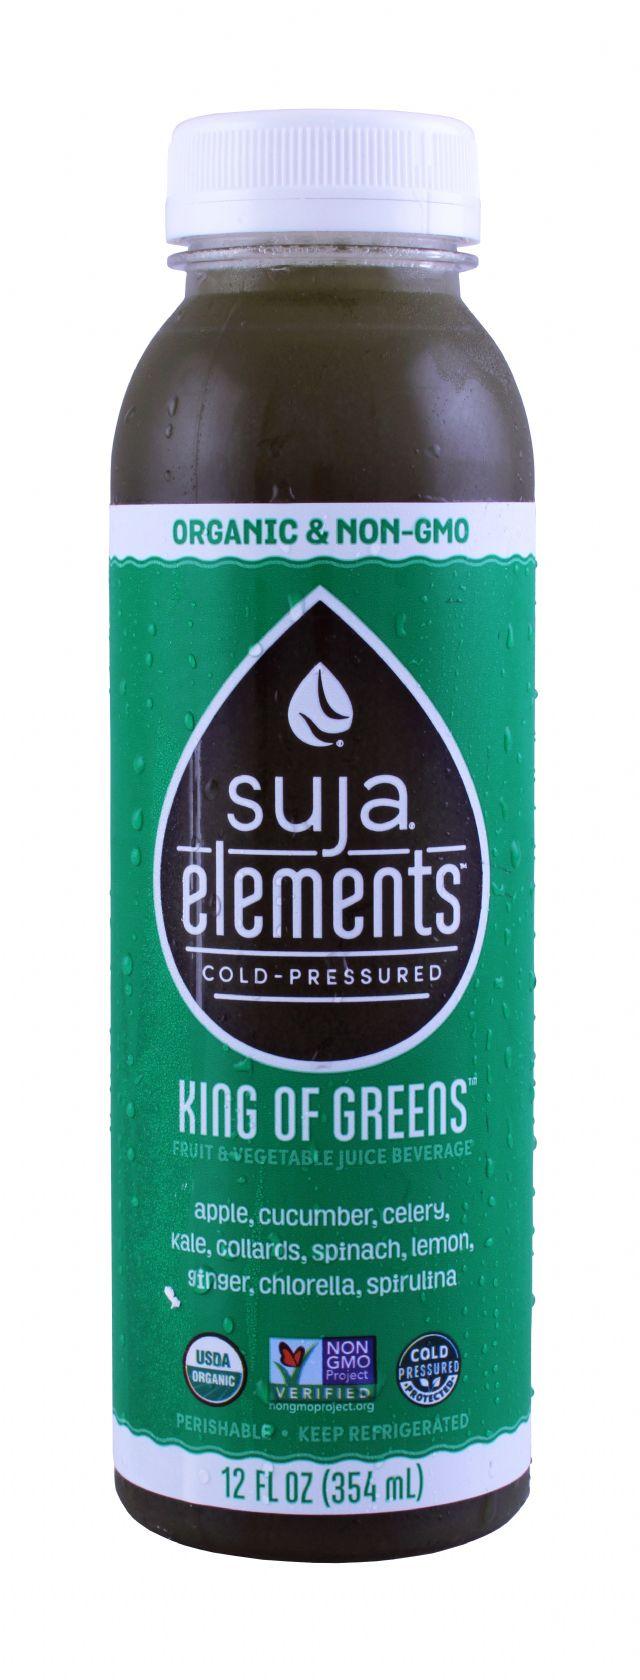 Suja Elements: Suja KingofGreens Front